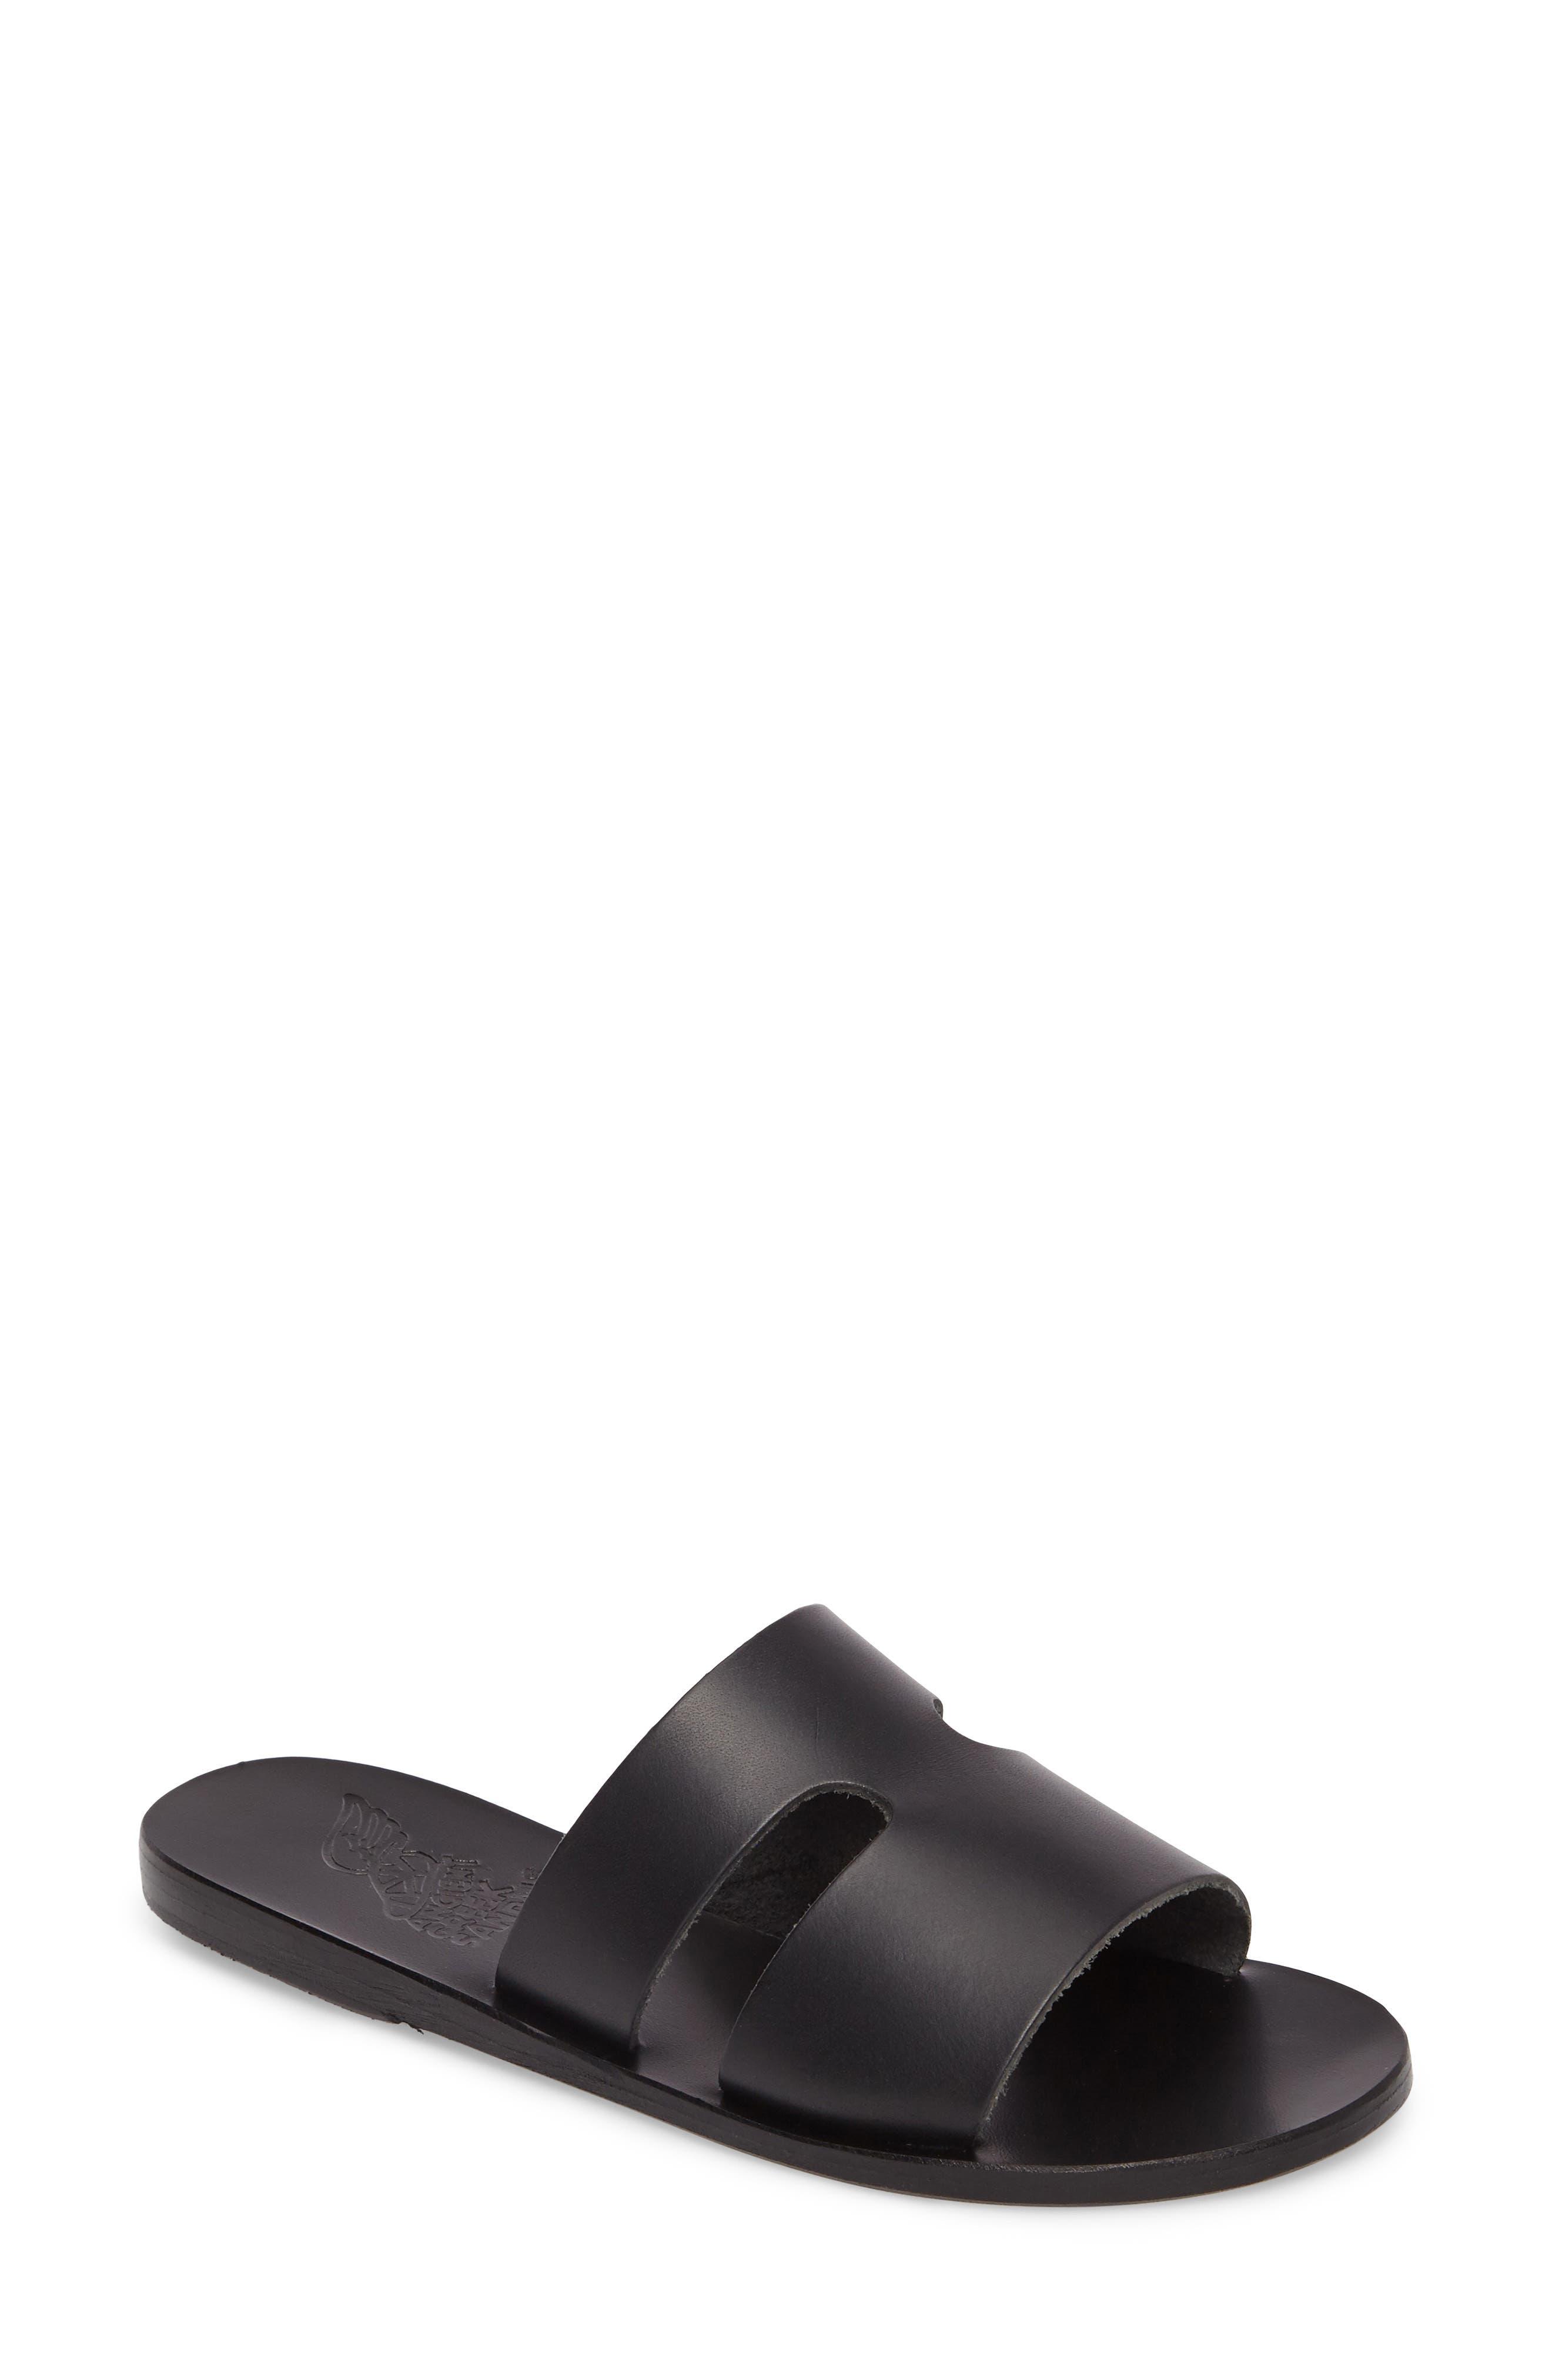 Apteros Genuine Calf Hair Slide Sandal,                             Main thumbnail 1, color,                             001